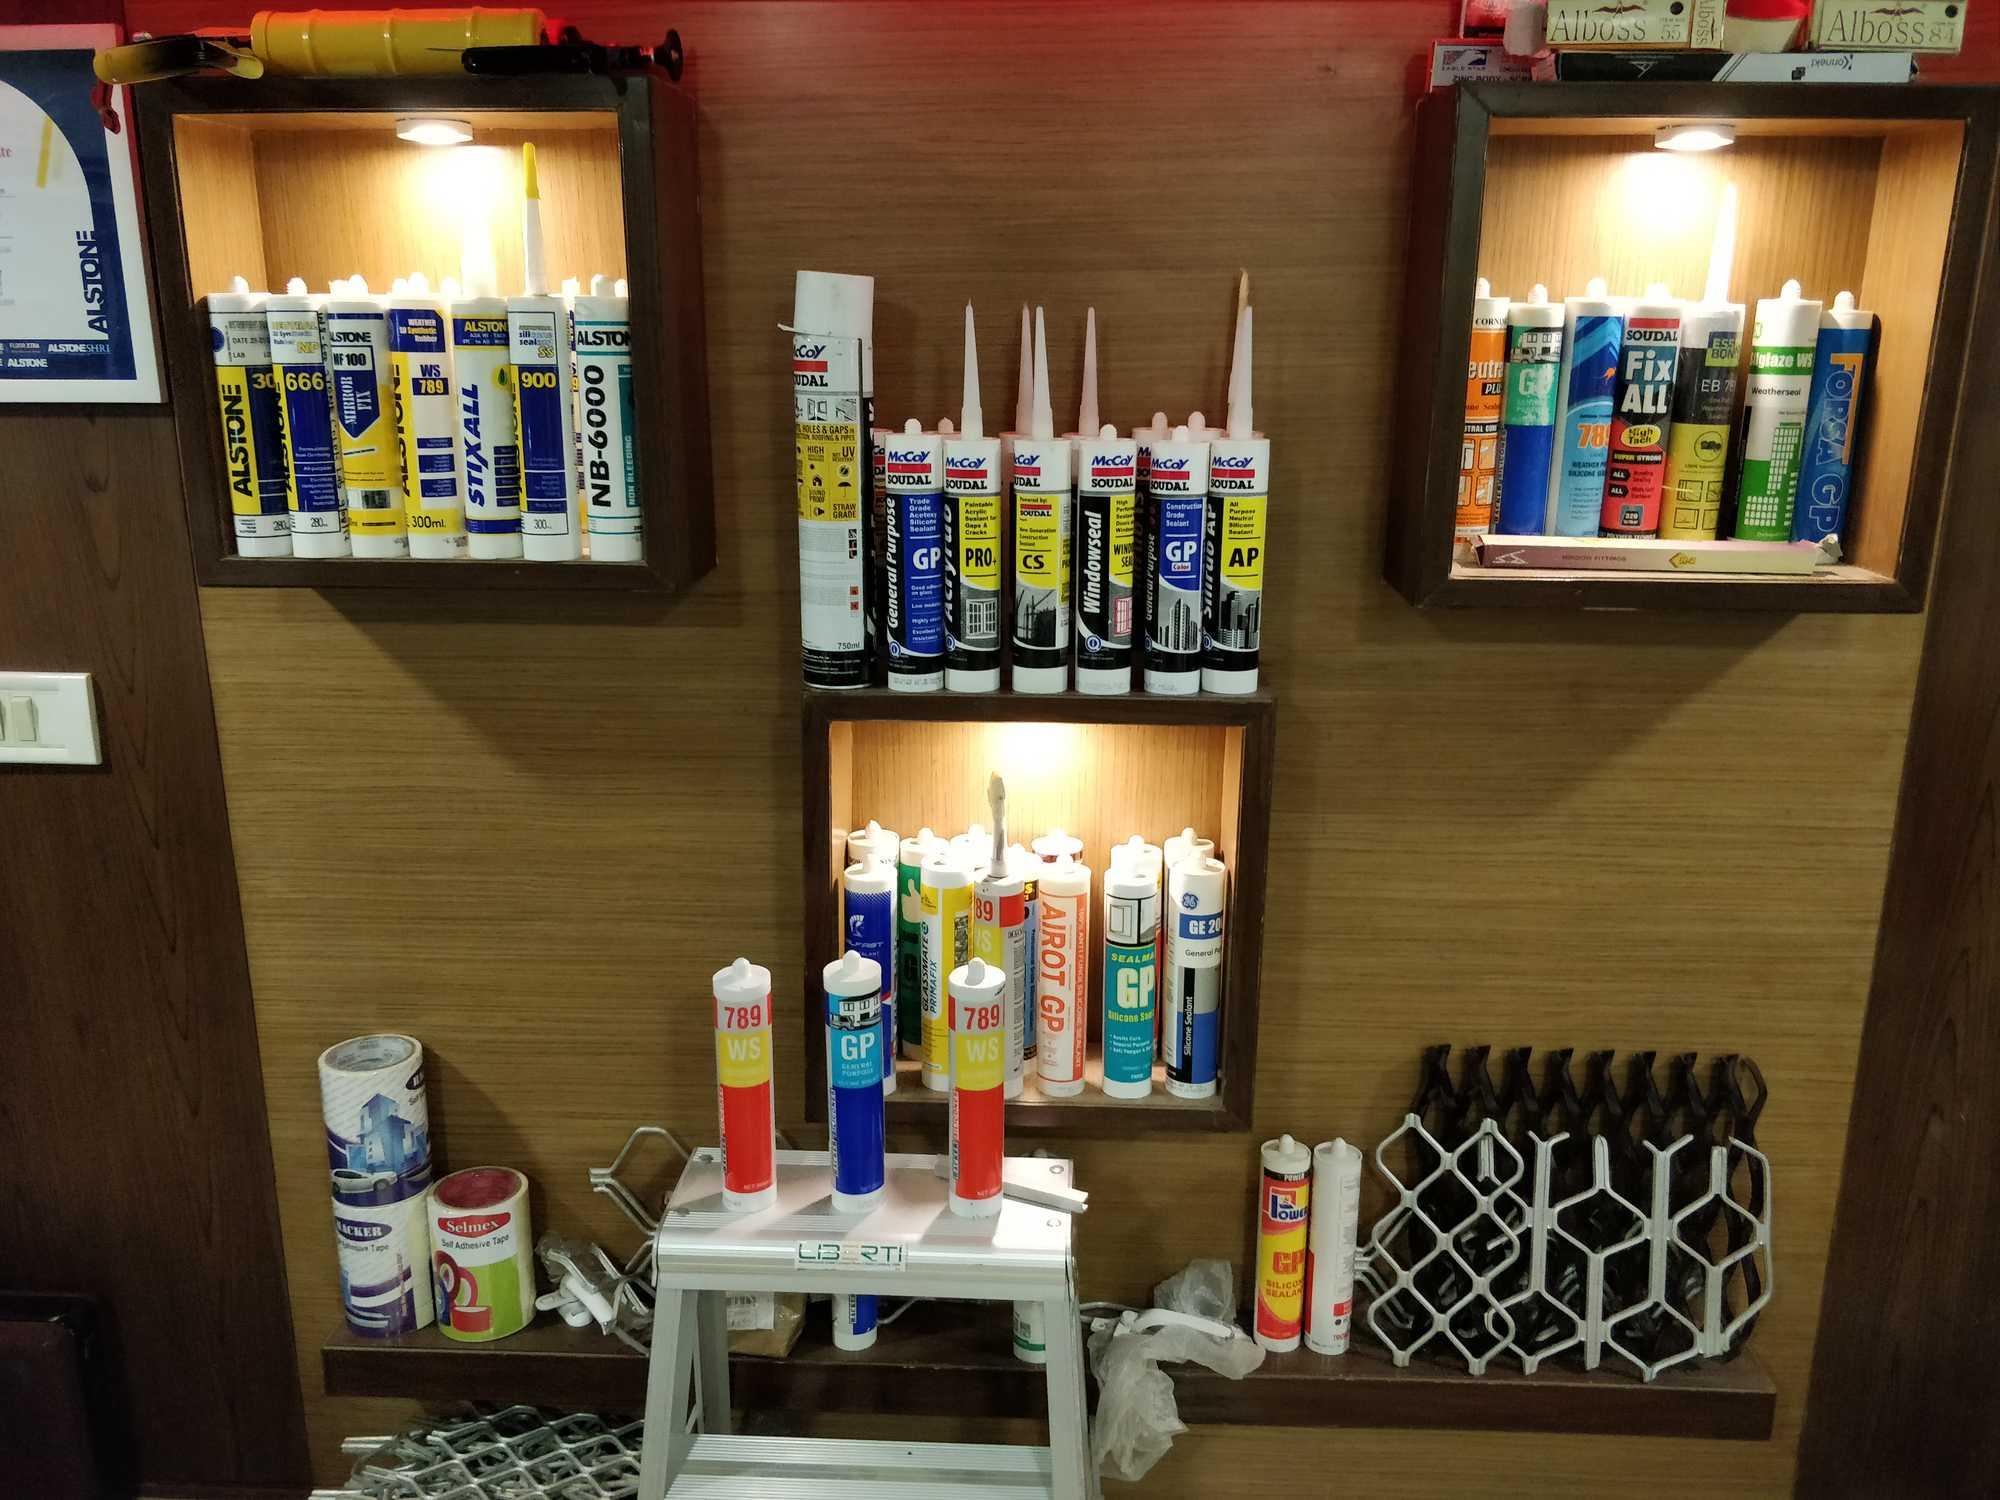 Top Mccoy Silicone Sealant Distributors in Delhi - Best Mccoy